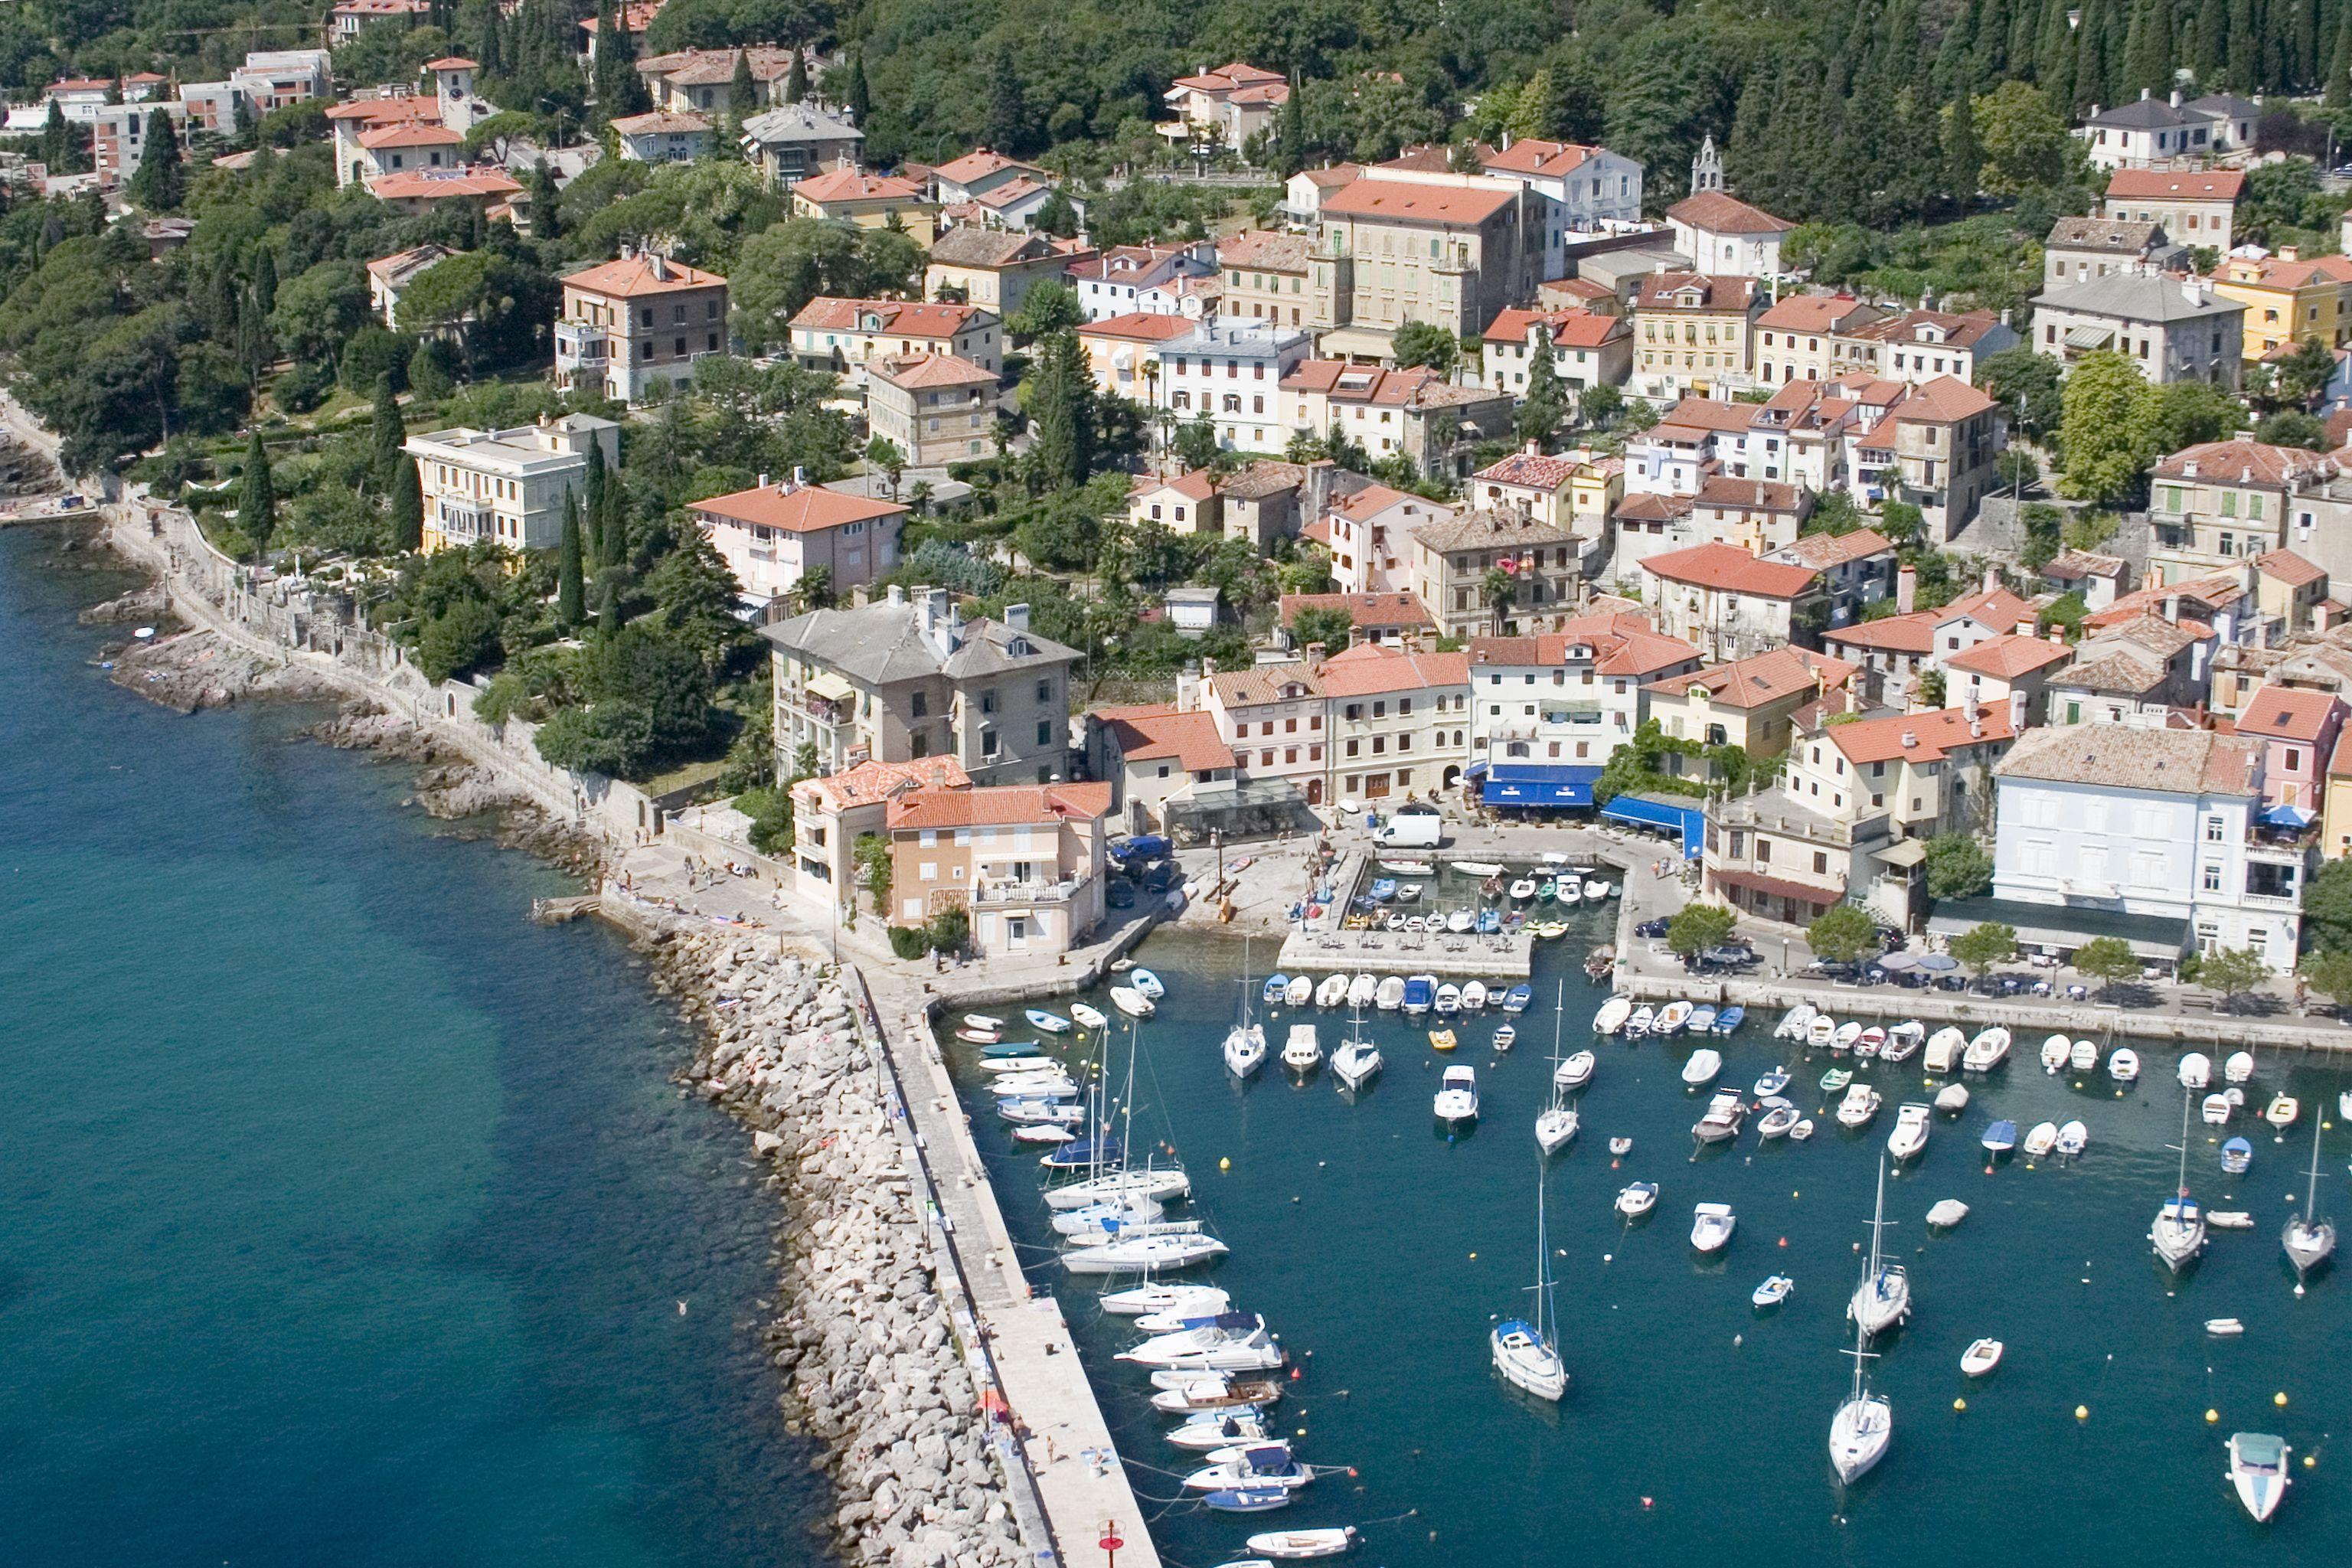 Volosko Opatija Croatia Croatia, Croatian coast